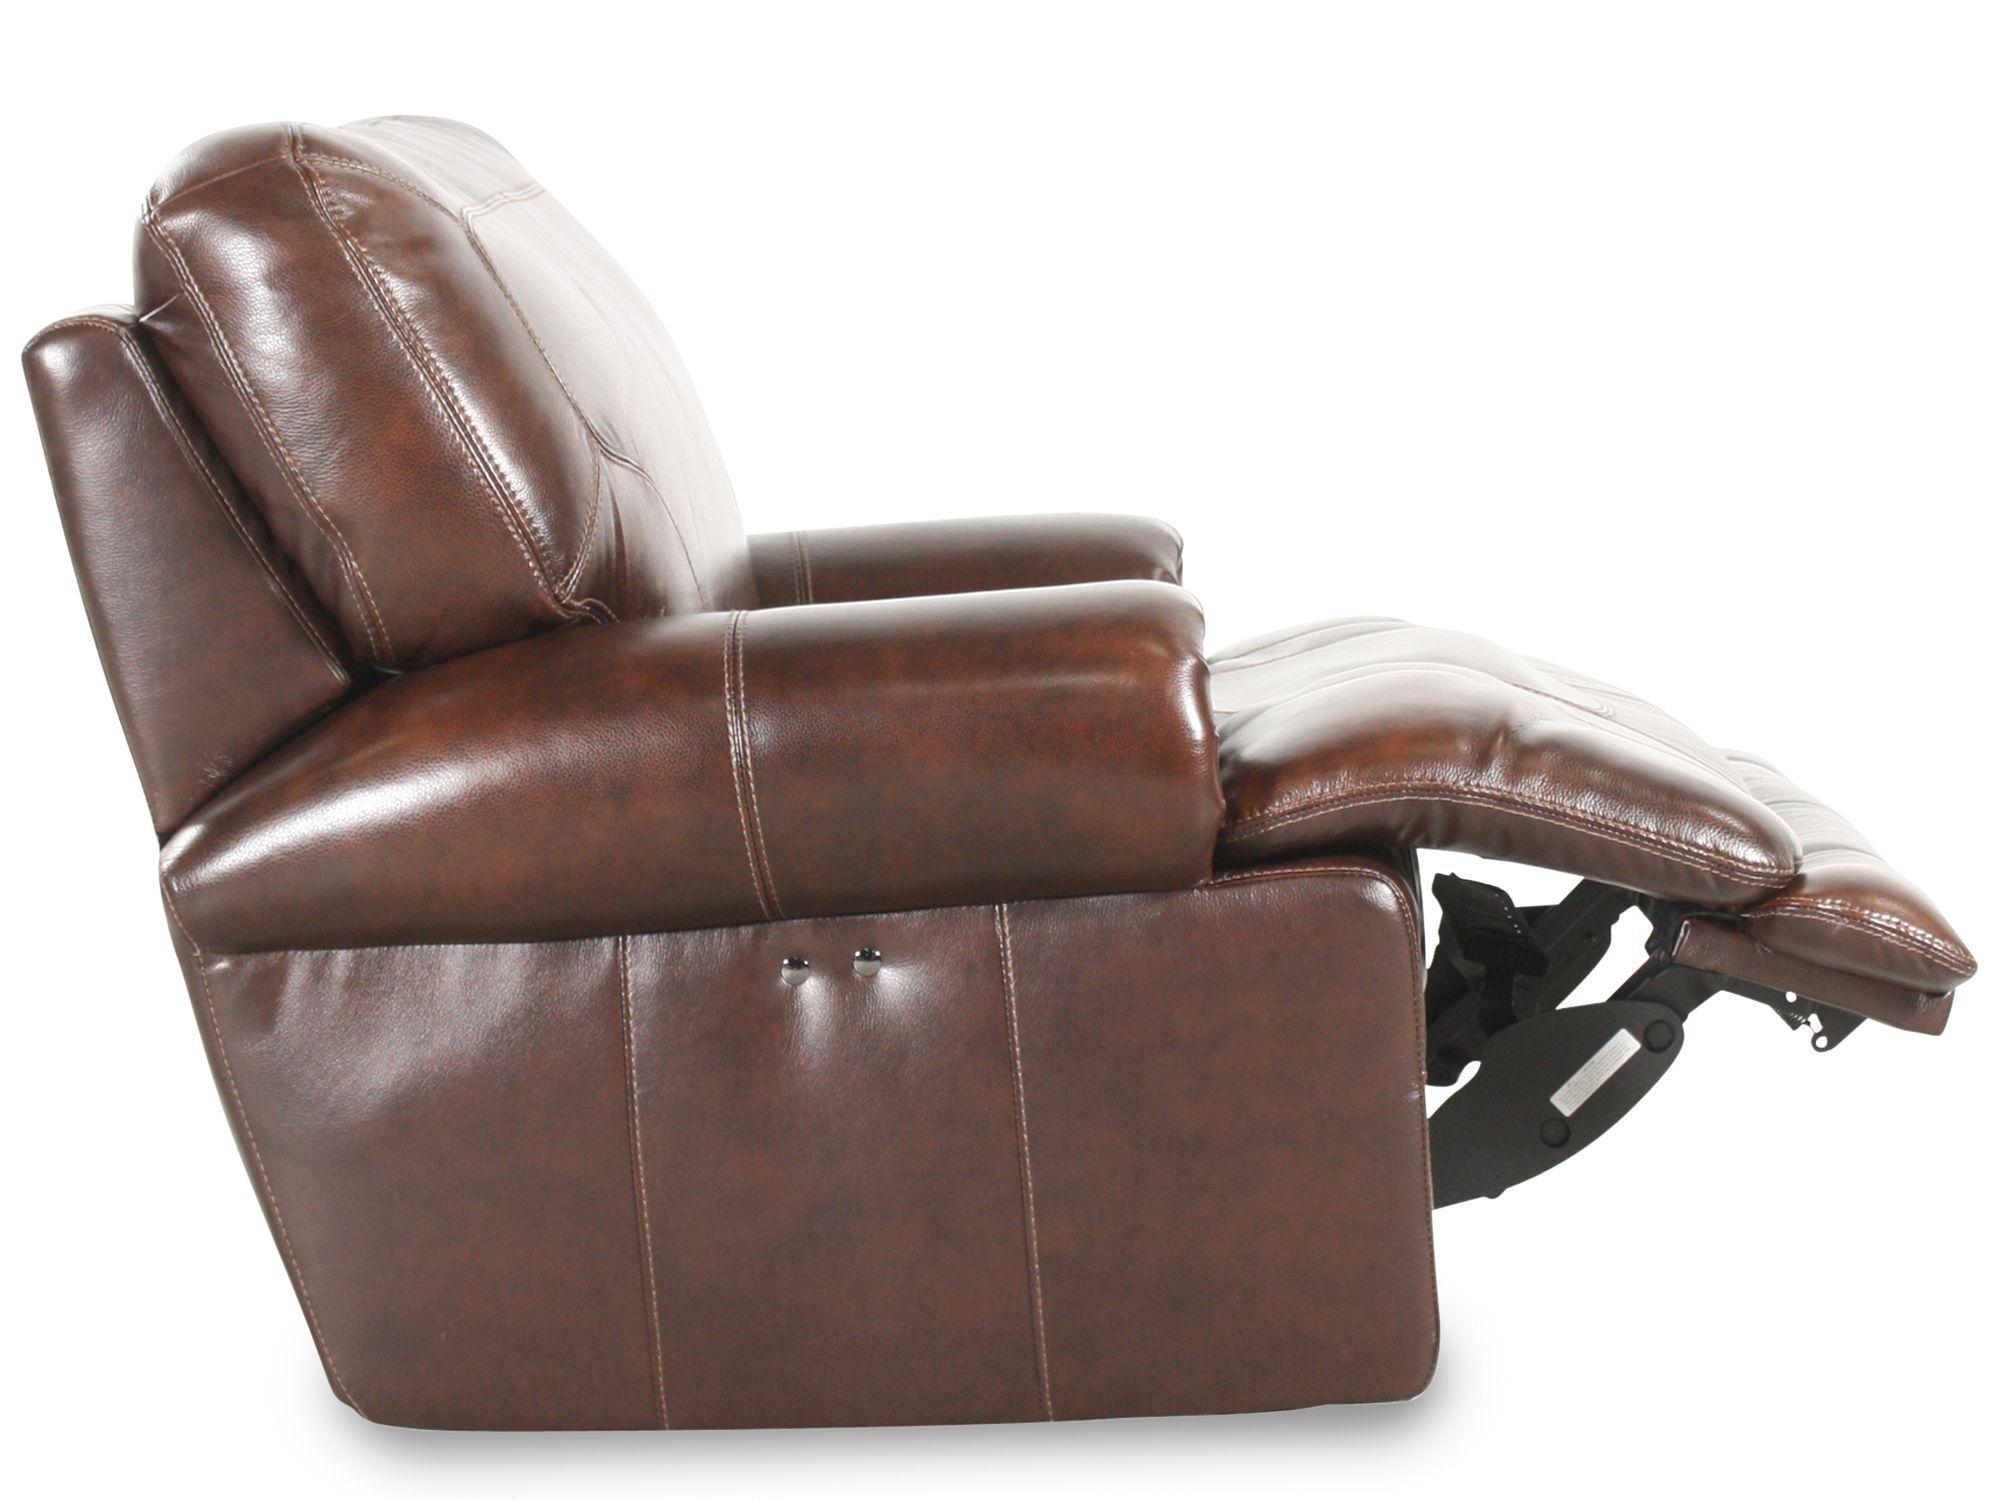 Simon Li Leather St&ede Coffee Recliner  sc 1 st  Mathis Brothers & Simon Li Leather Stampede Coffee Recliner | Mathis Brothers Furniture islam-shia.org